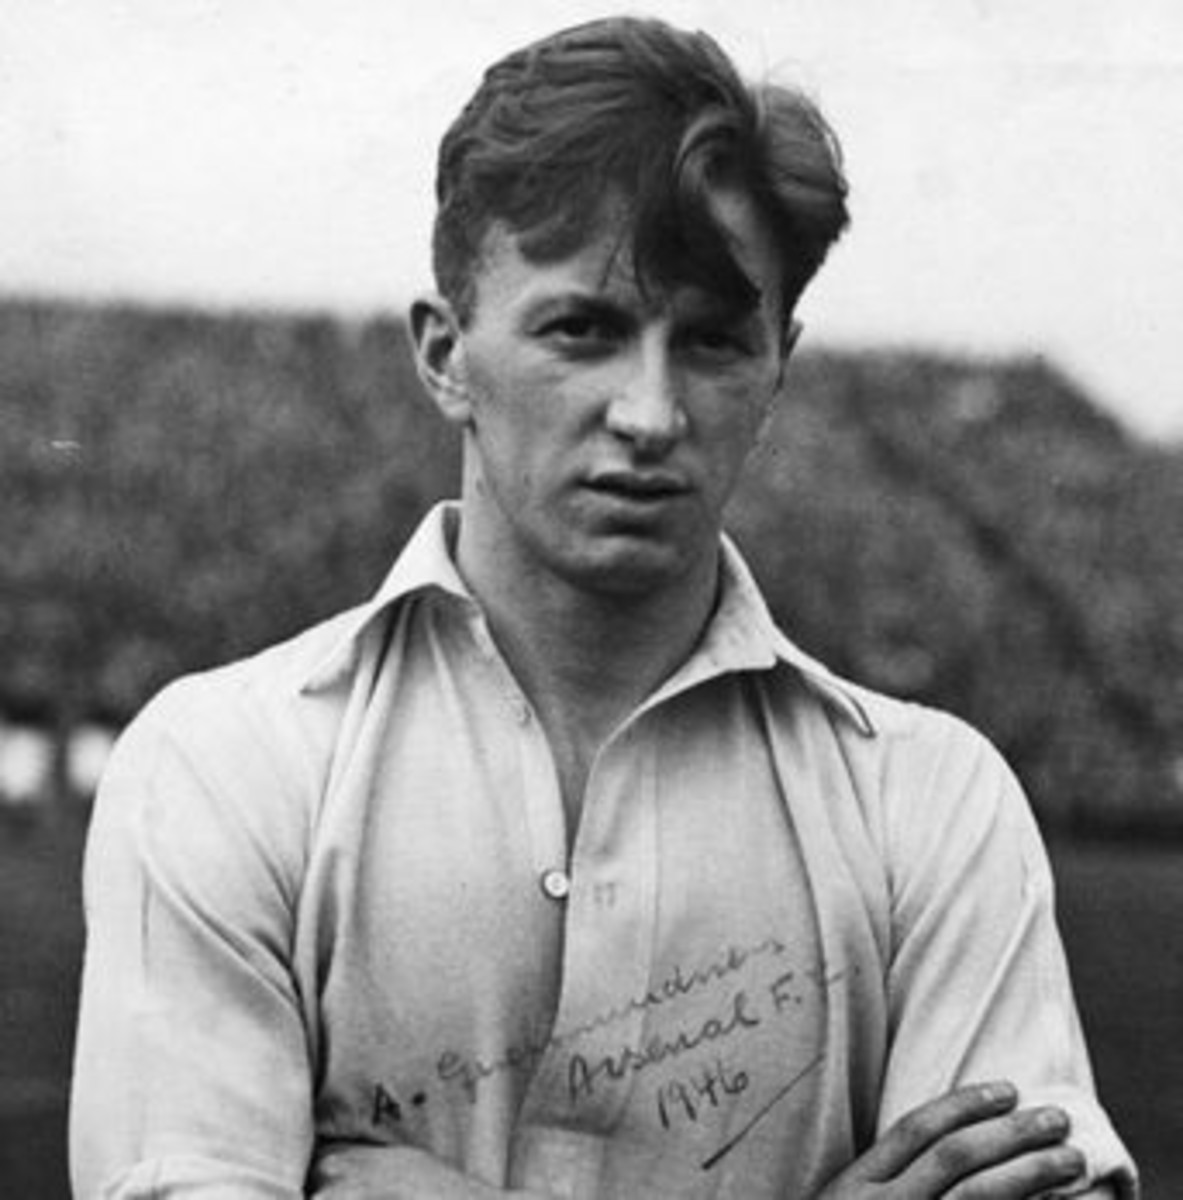 Albert Sigurður Guðmundsson is shown here while at Arsenal in 1946. Iceland's first professional football player, Albert Sigurður's footballing lineage includes his grandson and famed Icelandic commentator Guðmundur Benediktsson.